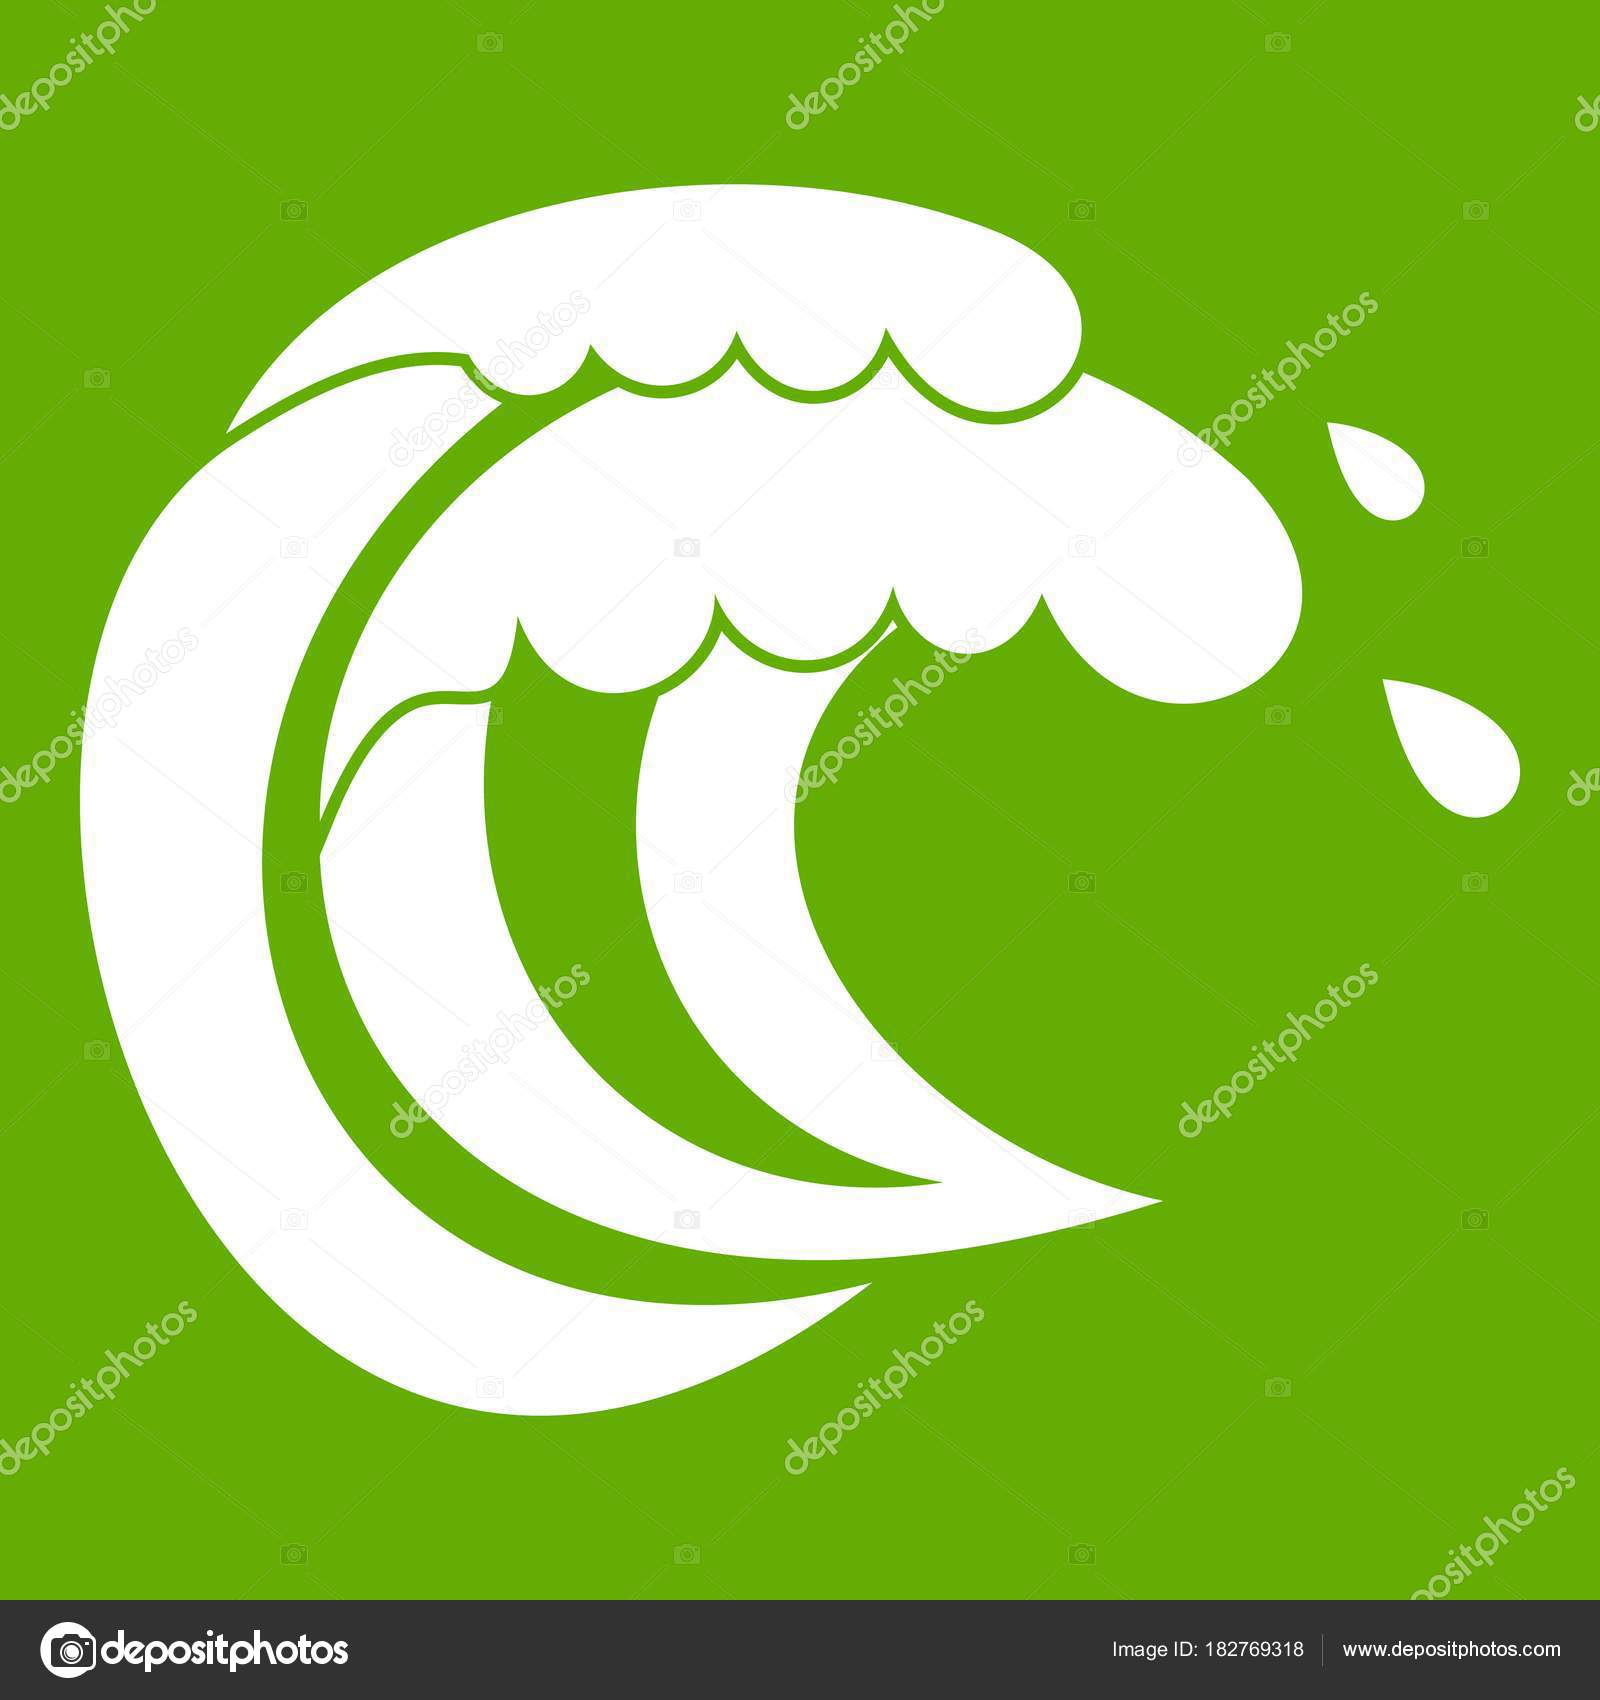 Wave of sea tide icon green stock vector ylivdesign 182769318 wave of sea tide icon green stock vector 182769318 biocorpaavc